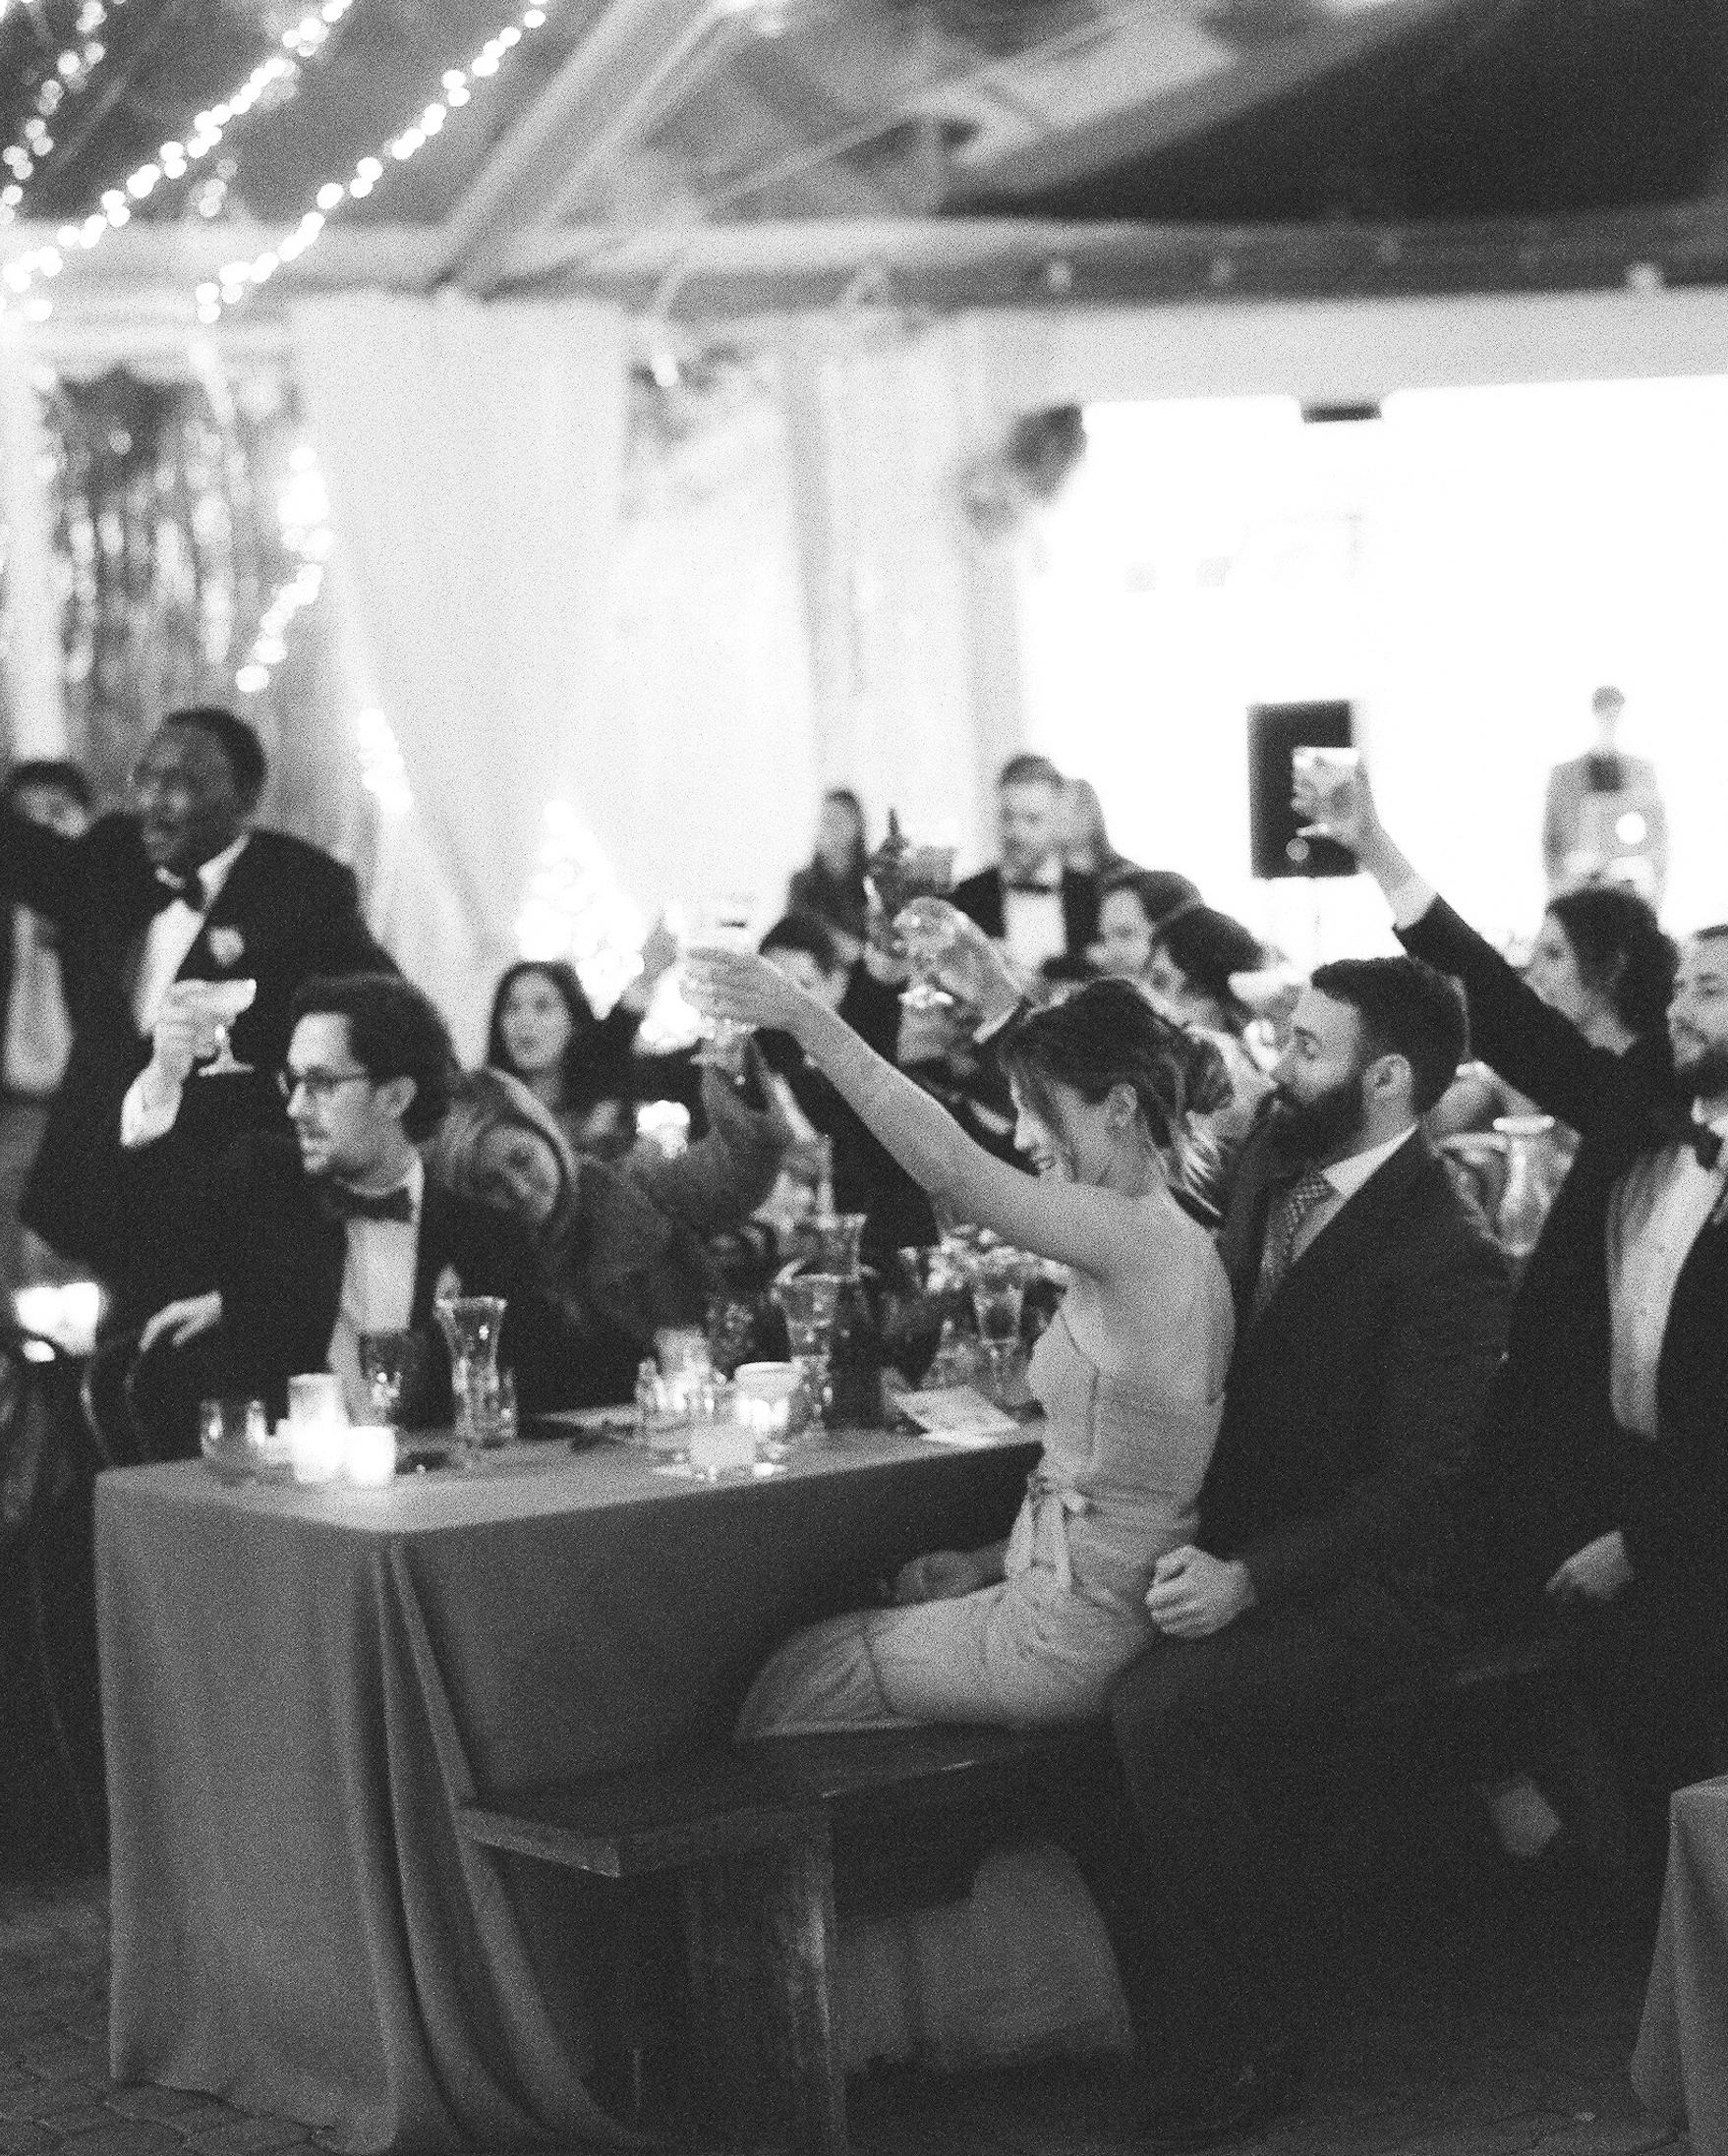 stacey-adam-wedding-toast-0103-s112112-0815.jpg